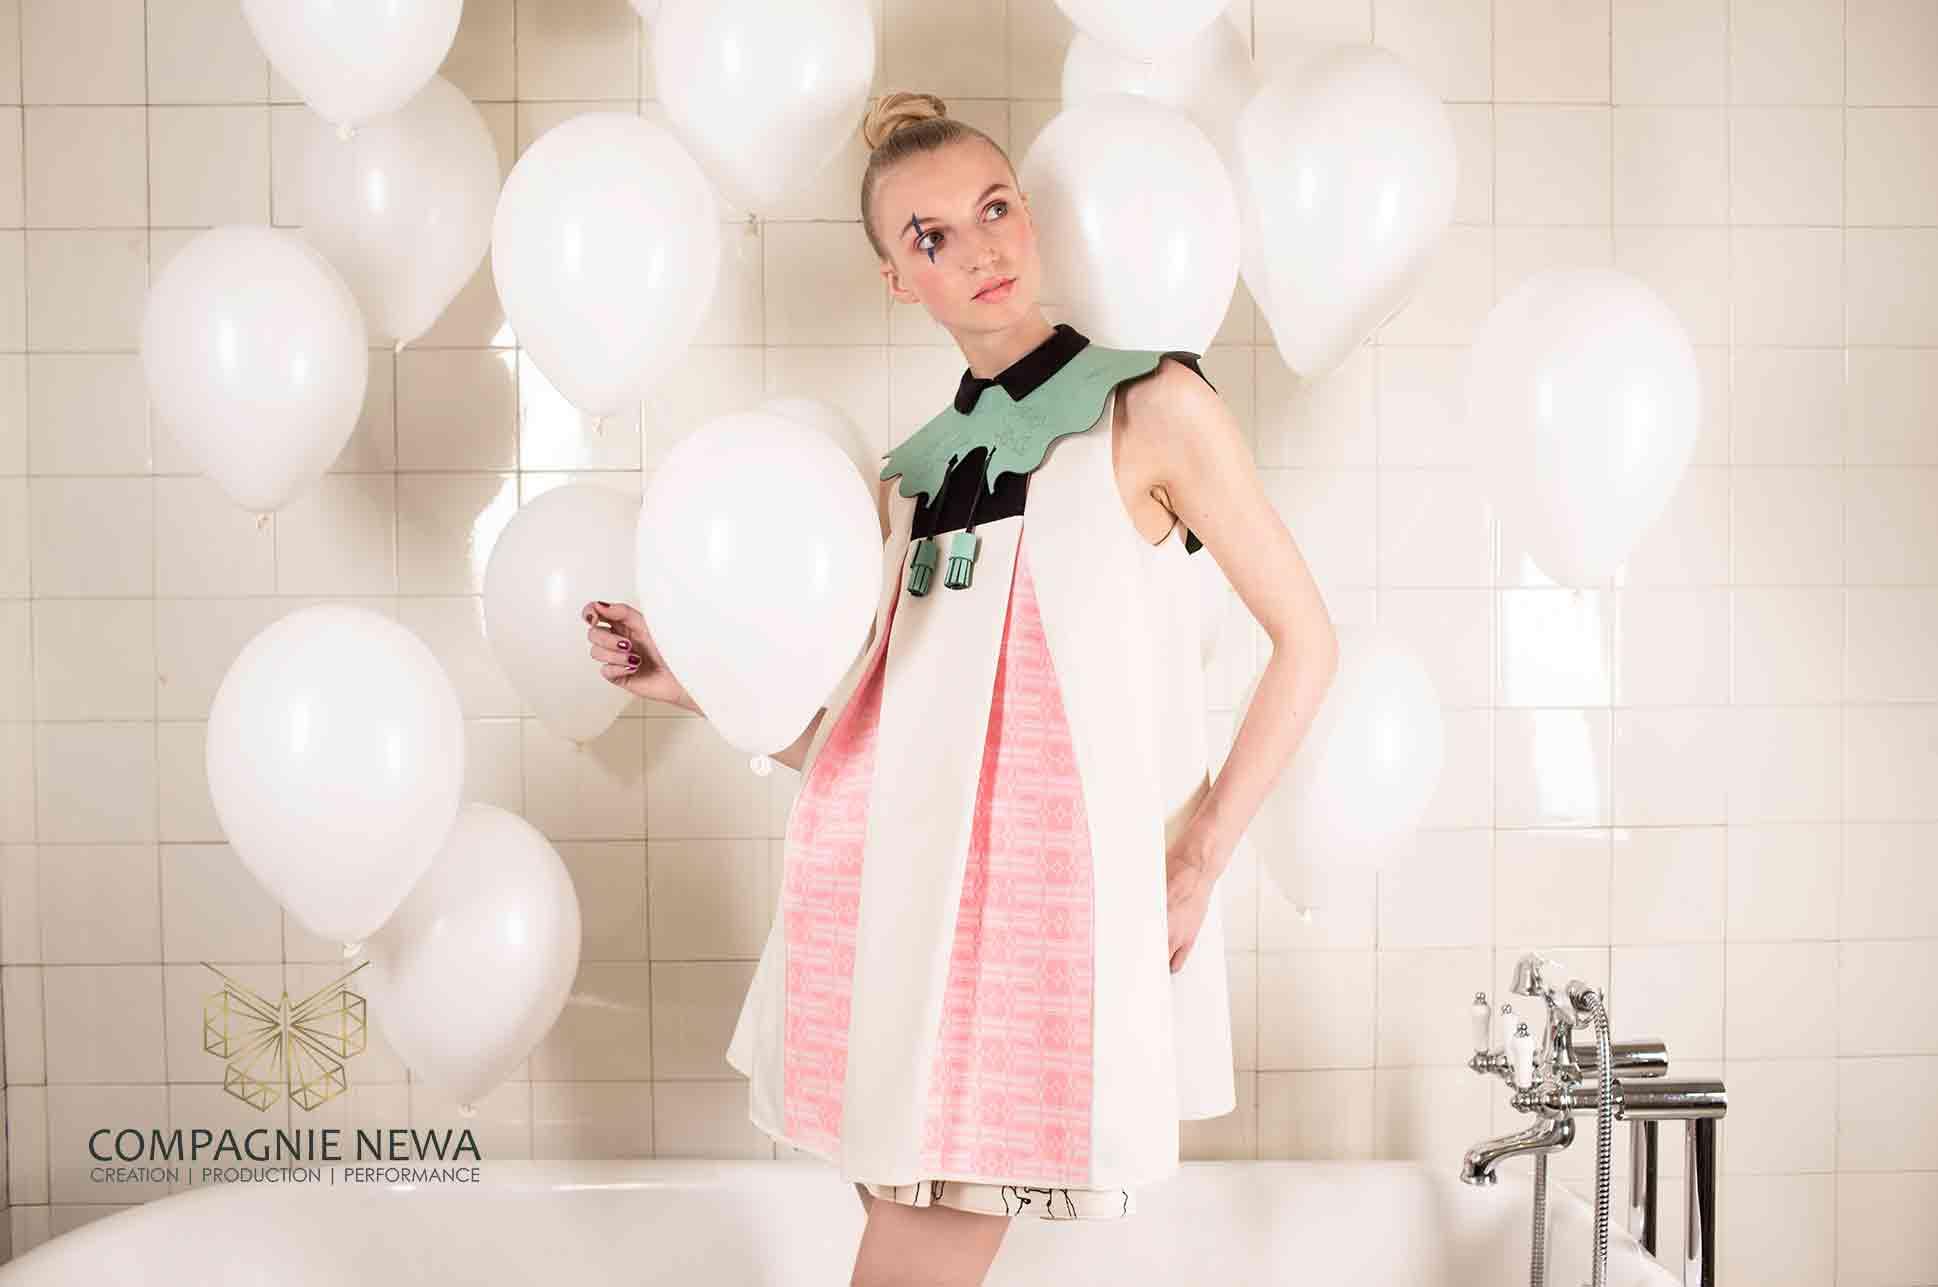 Compagnie_NEWA_elleloux_models_editorial_antwerpen